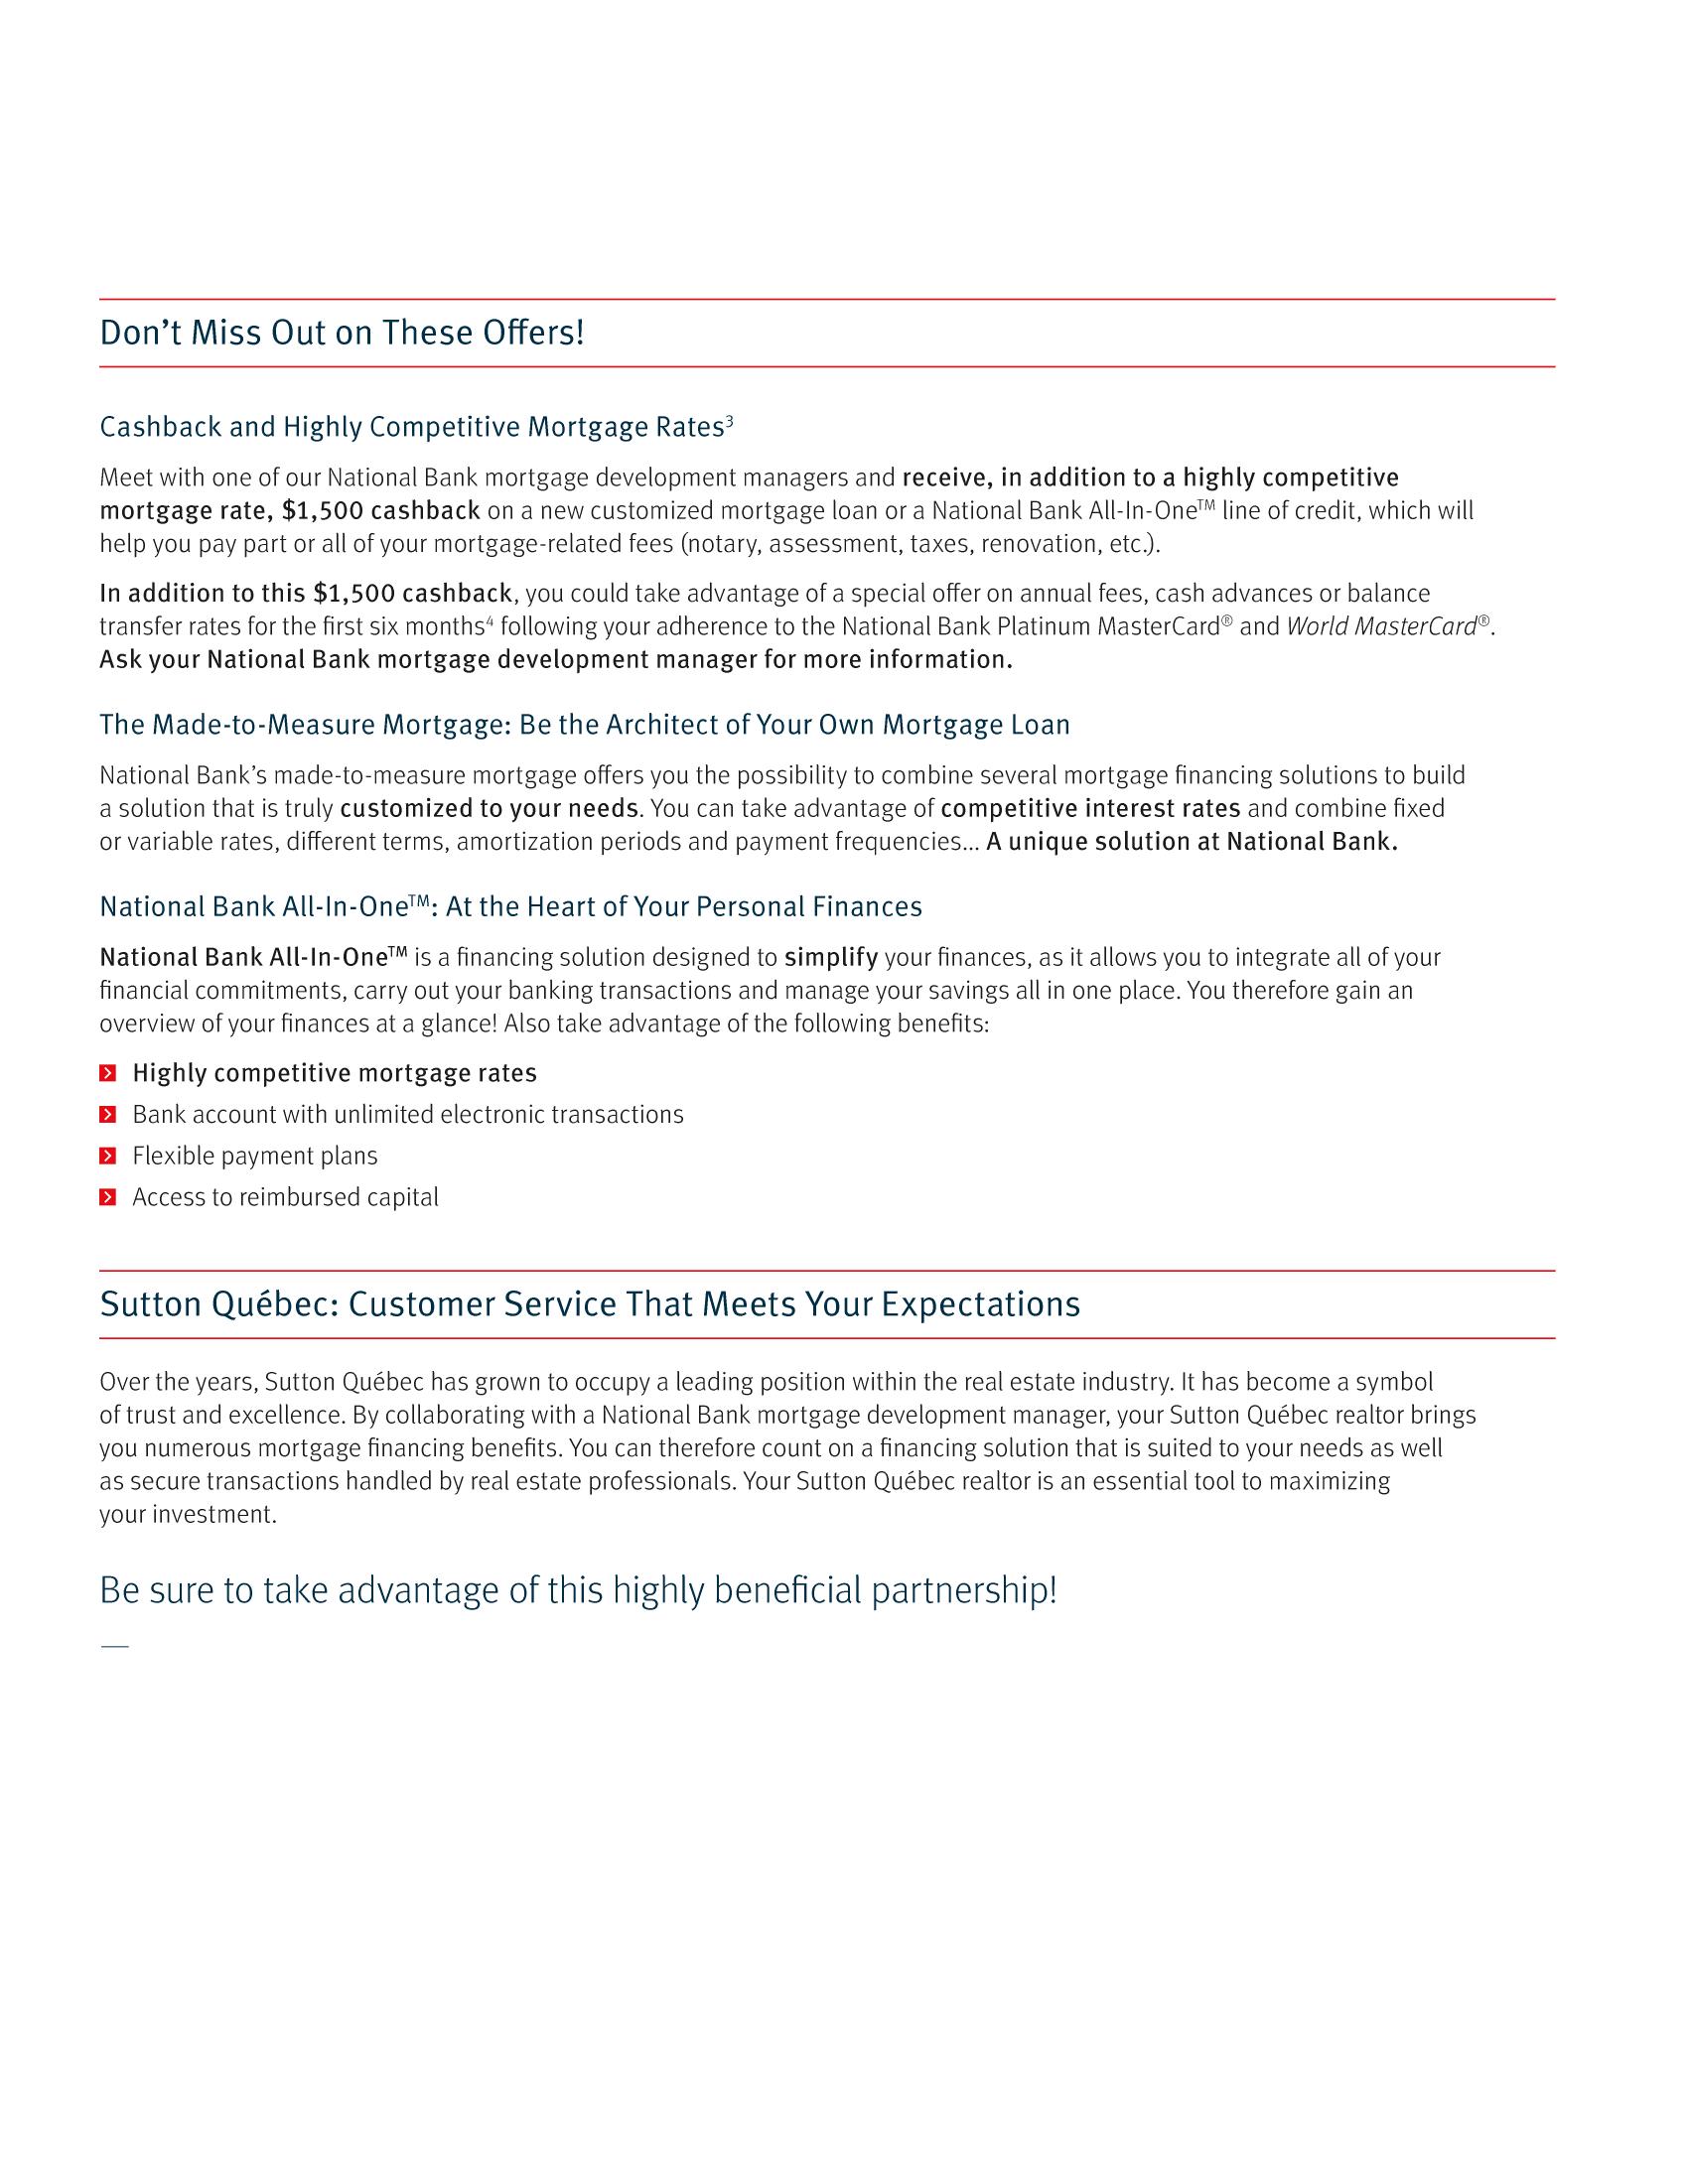 "3 | Leaflet ""A Partnership with a Wealth of Advantages"" - Sutton"